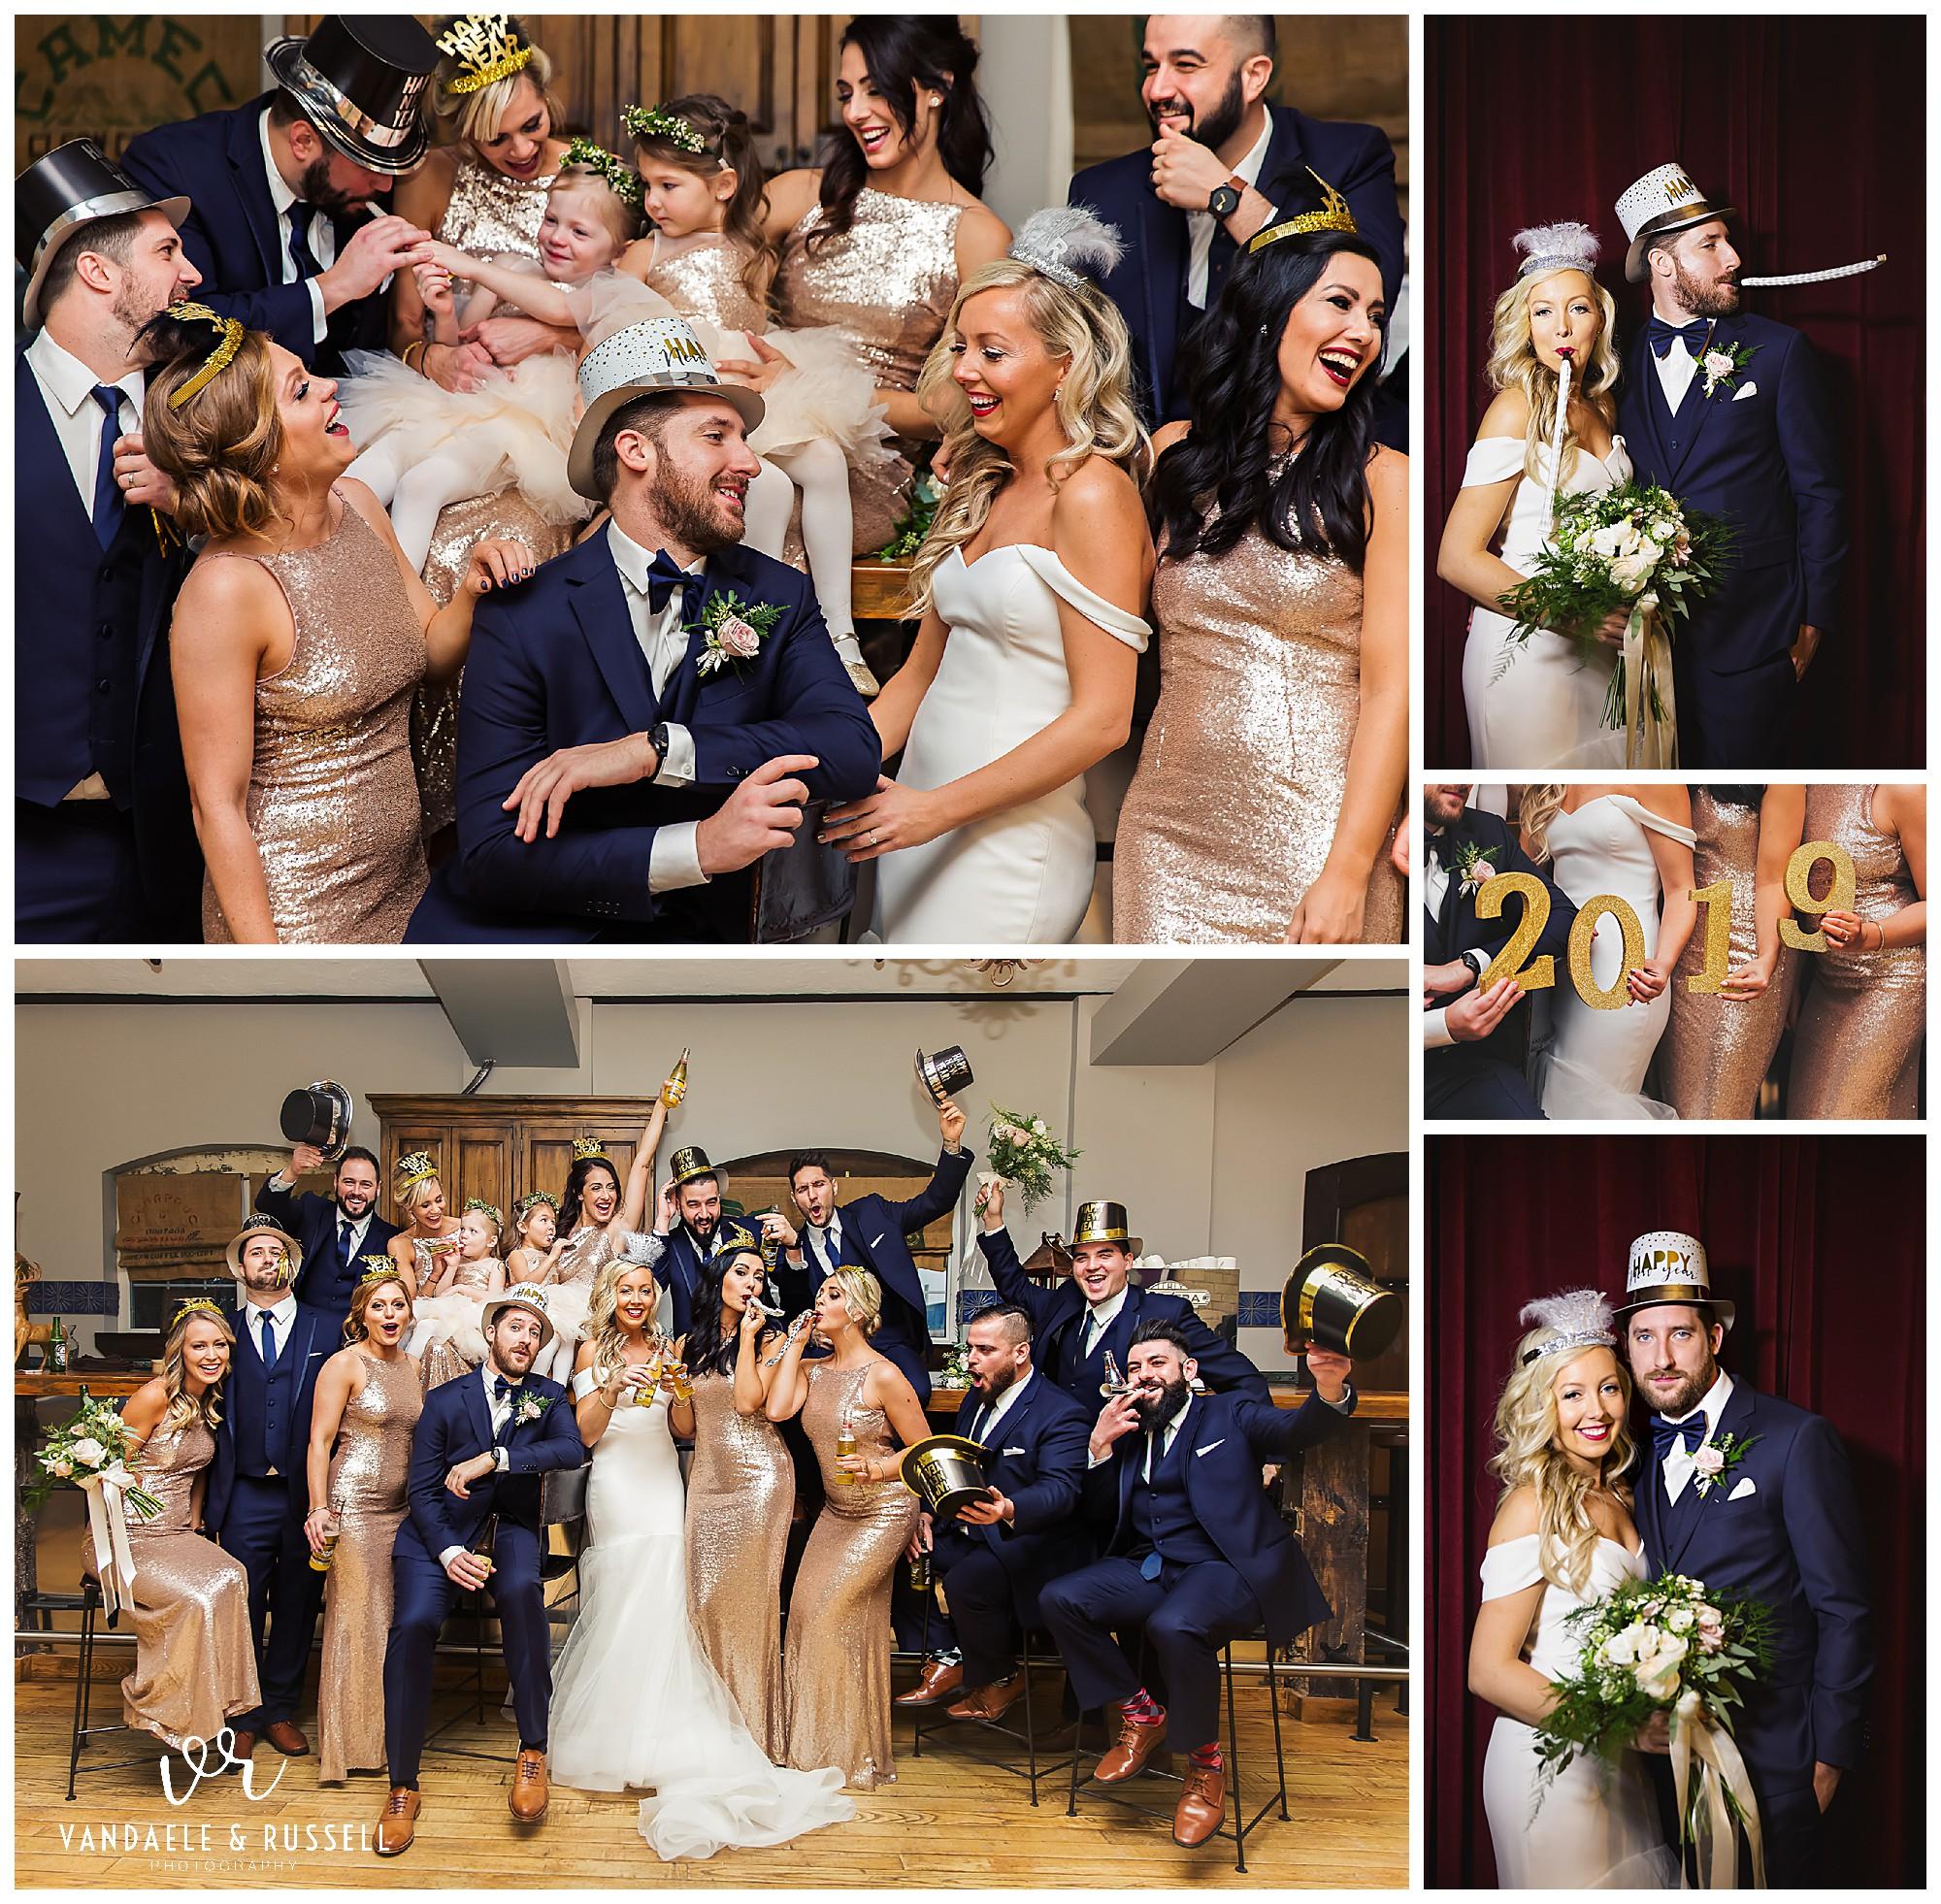 Hacienda-Sarria-Wedding-Photos-NYE-Michelle-Matt-VanDaele-Russell_0012.jpg